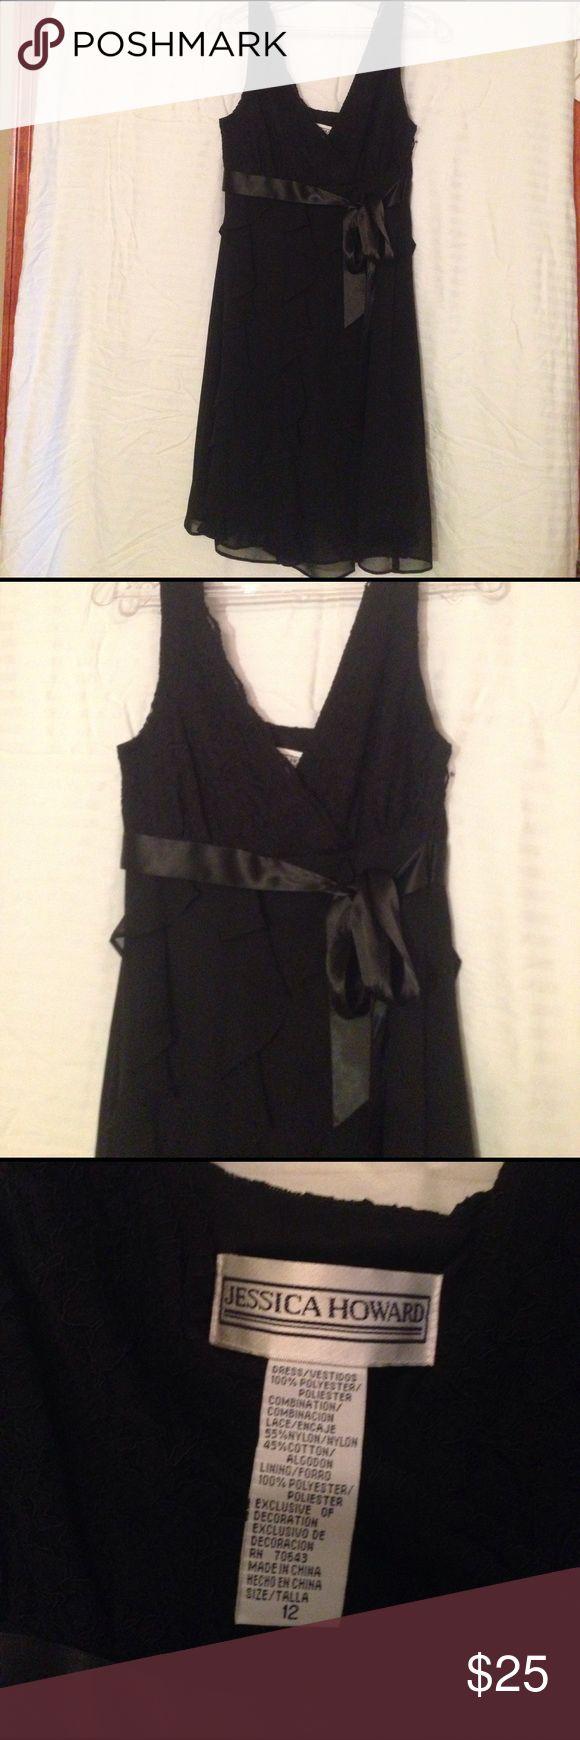 Black Ruffle knee length dress Side zip, scallop lace V-neckline. Ruffles all around skirt Jessica Howard Dresses Mini